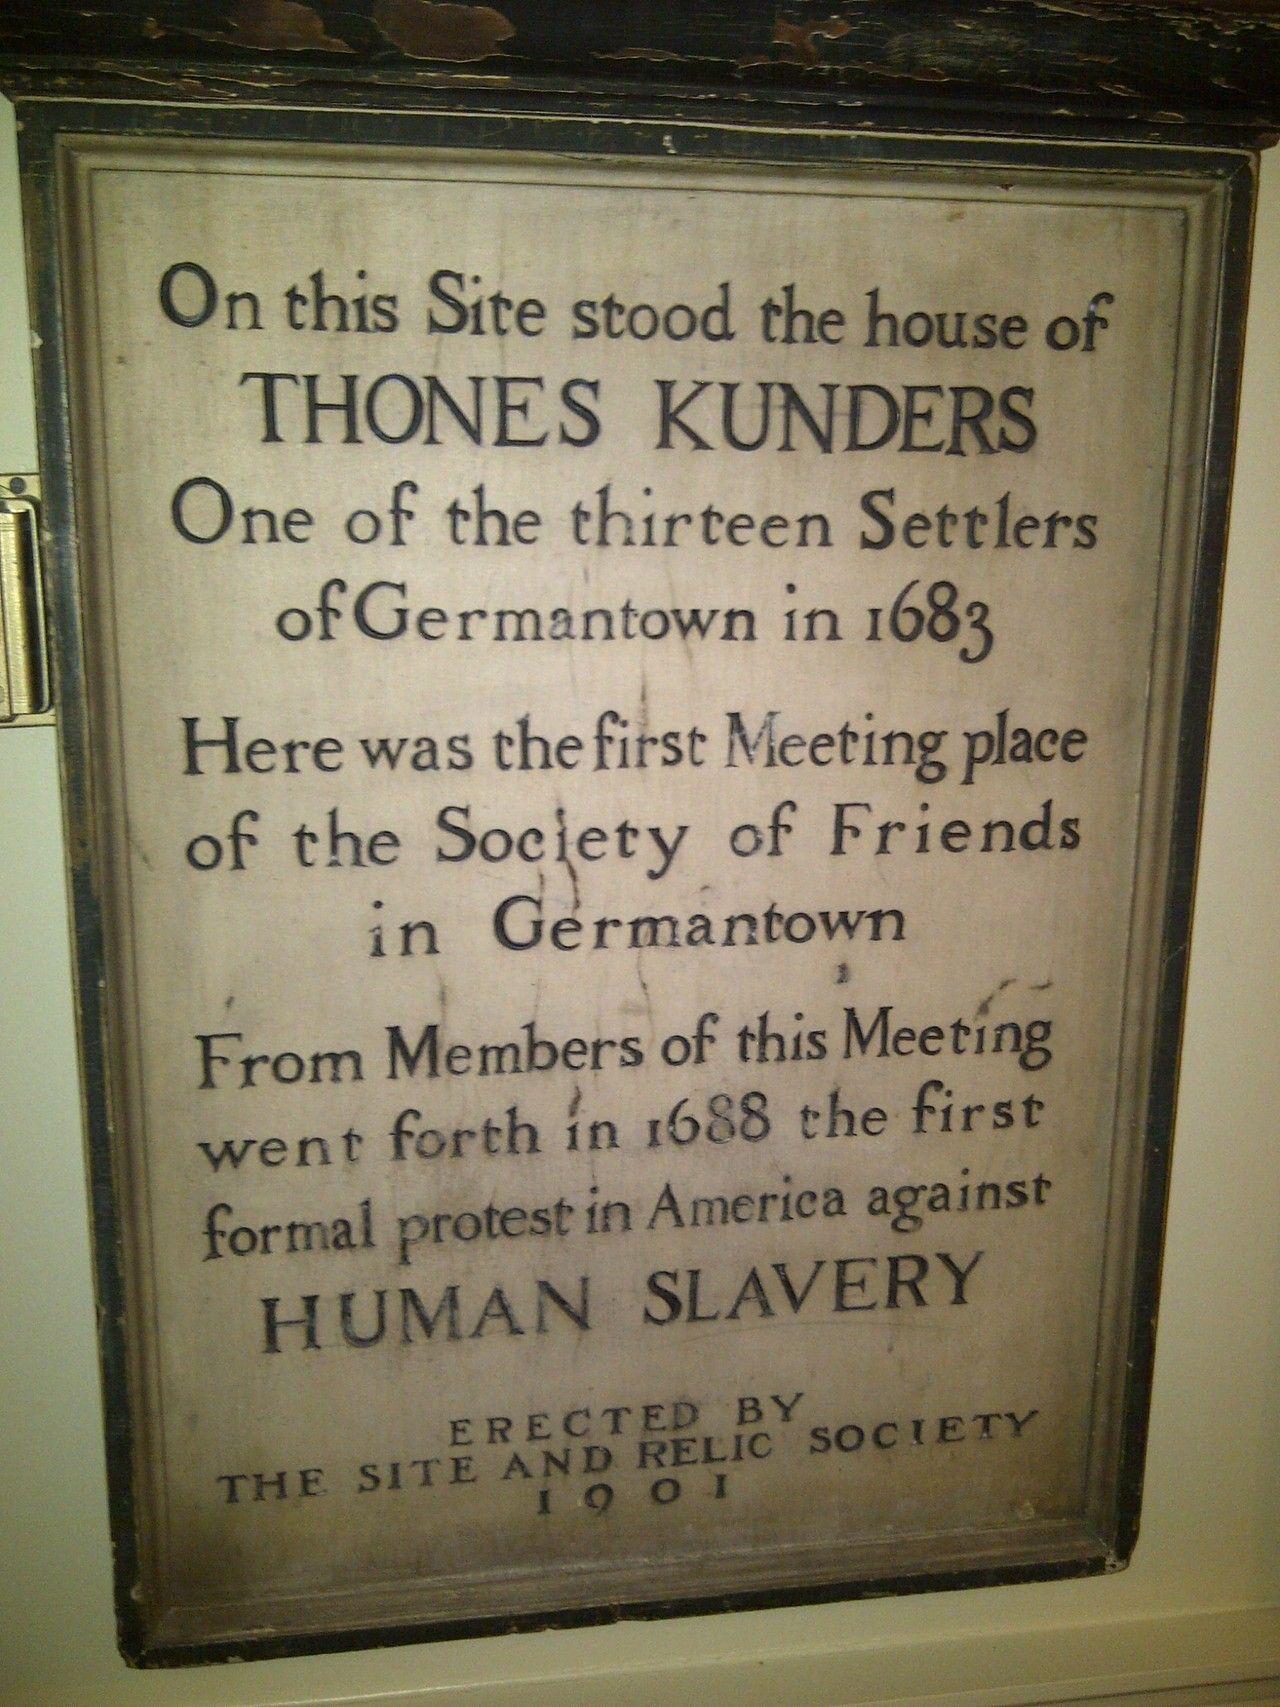 1688 Protest against slavery | Anthony Benezet Symposium | Germantown Historical Society.http://t.co/9HVF6RXtuz